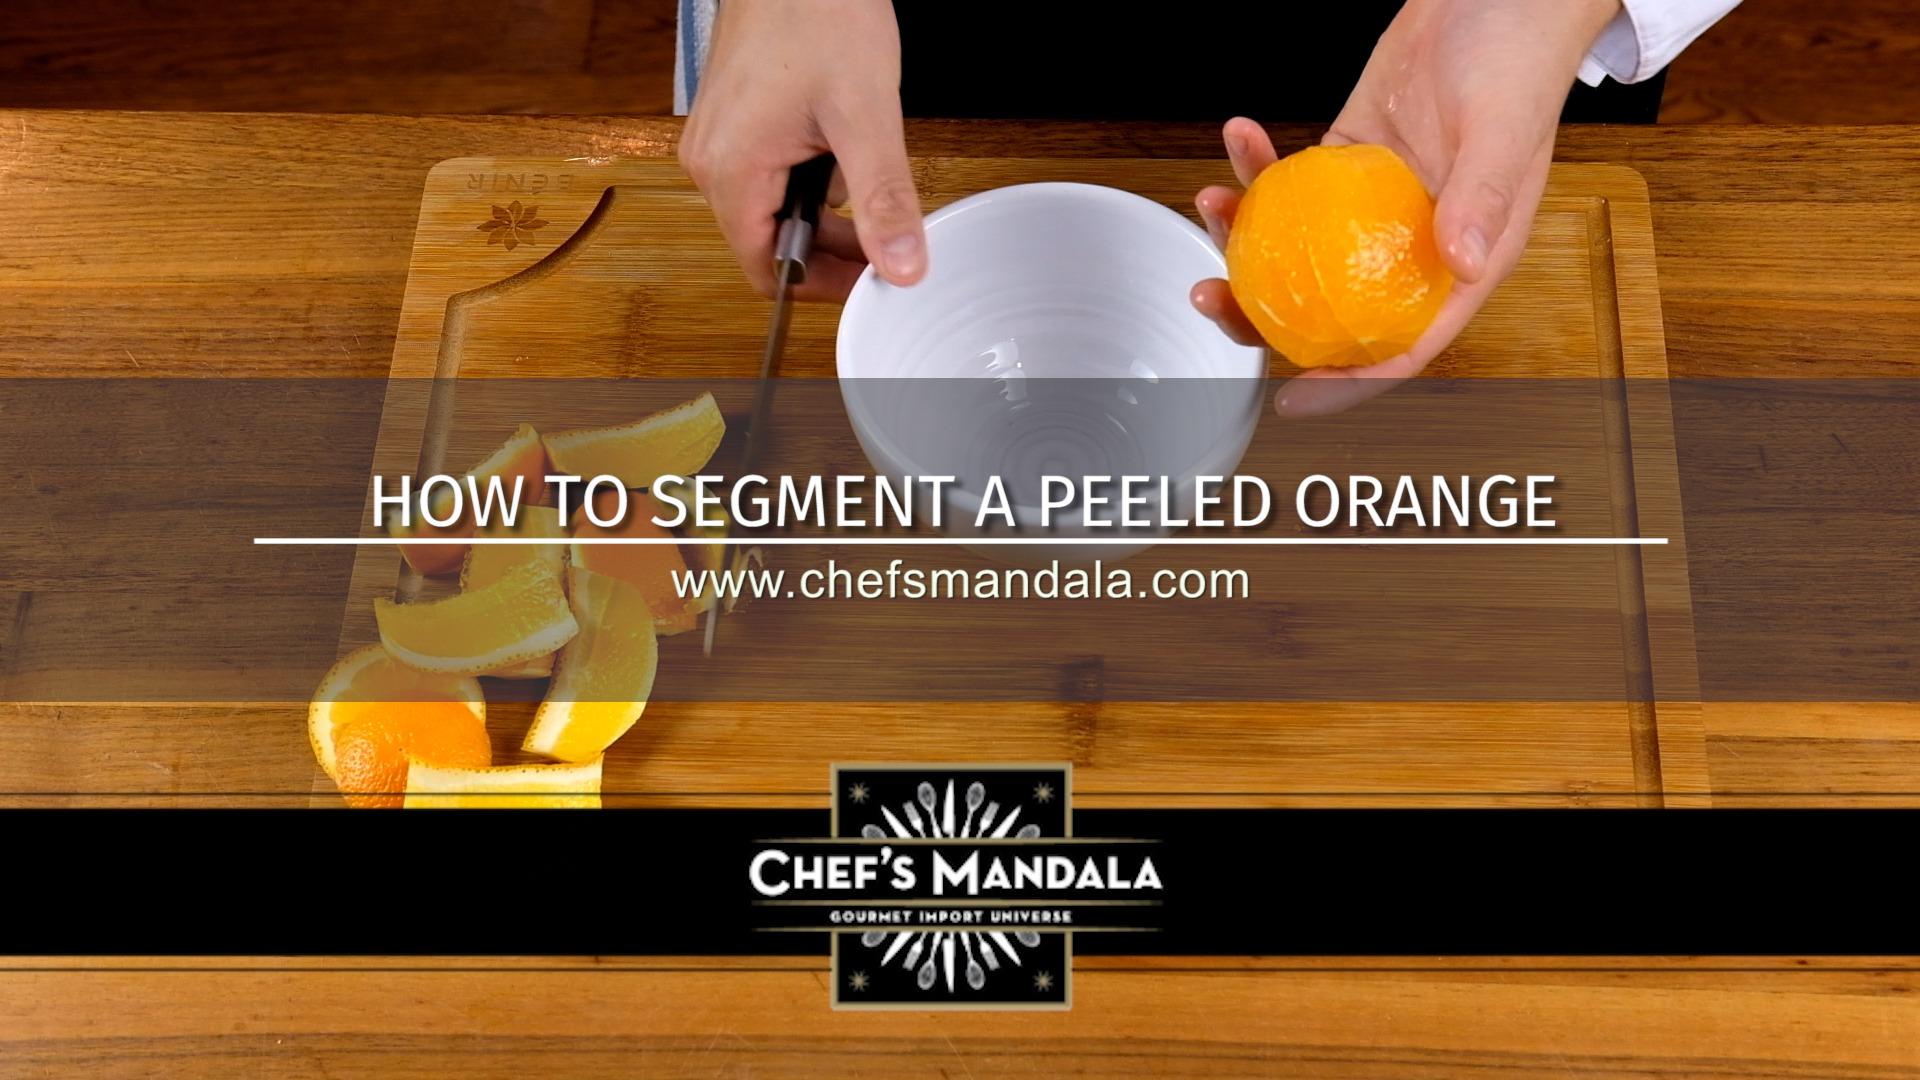 HOW TO SEGMENT A PEELED ORANGE